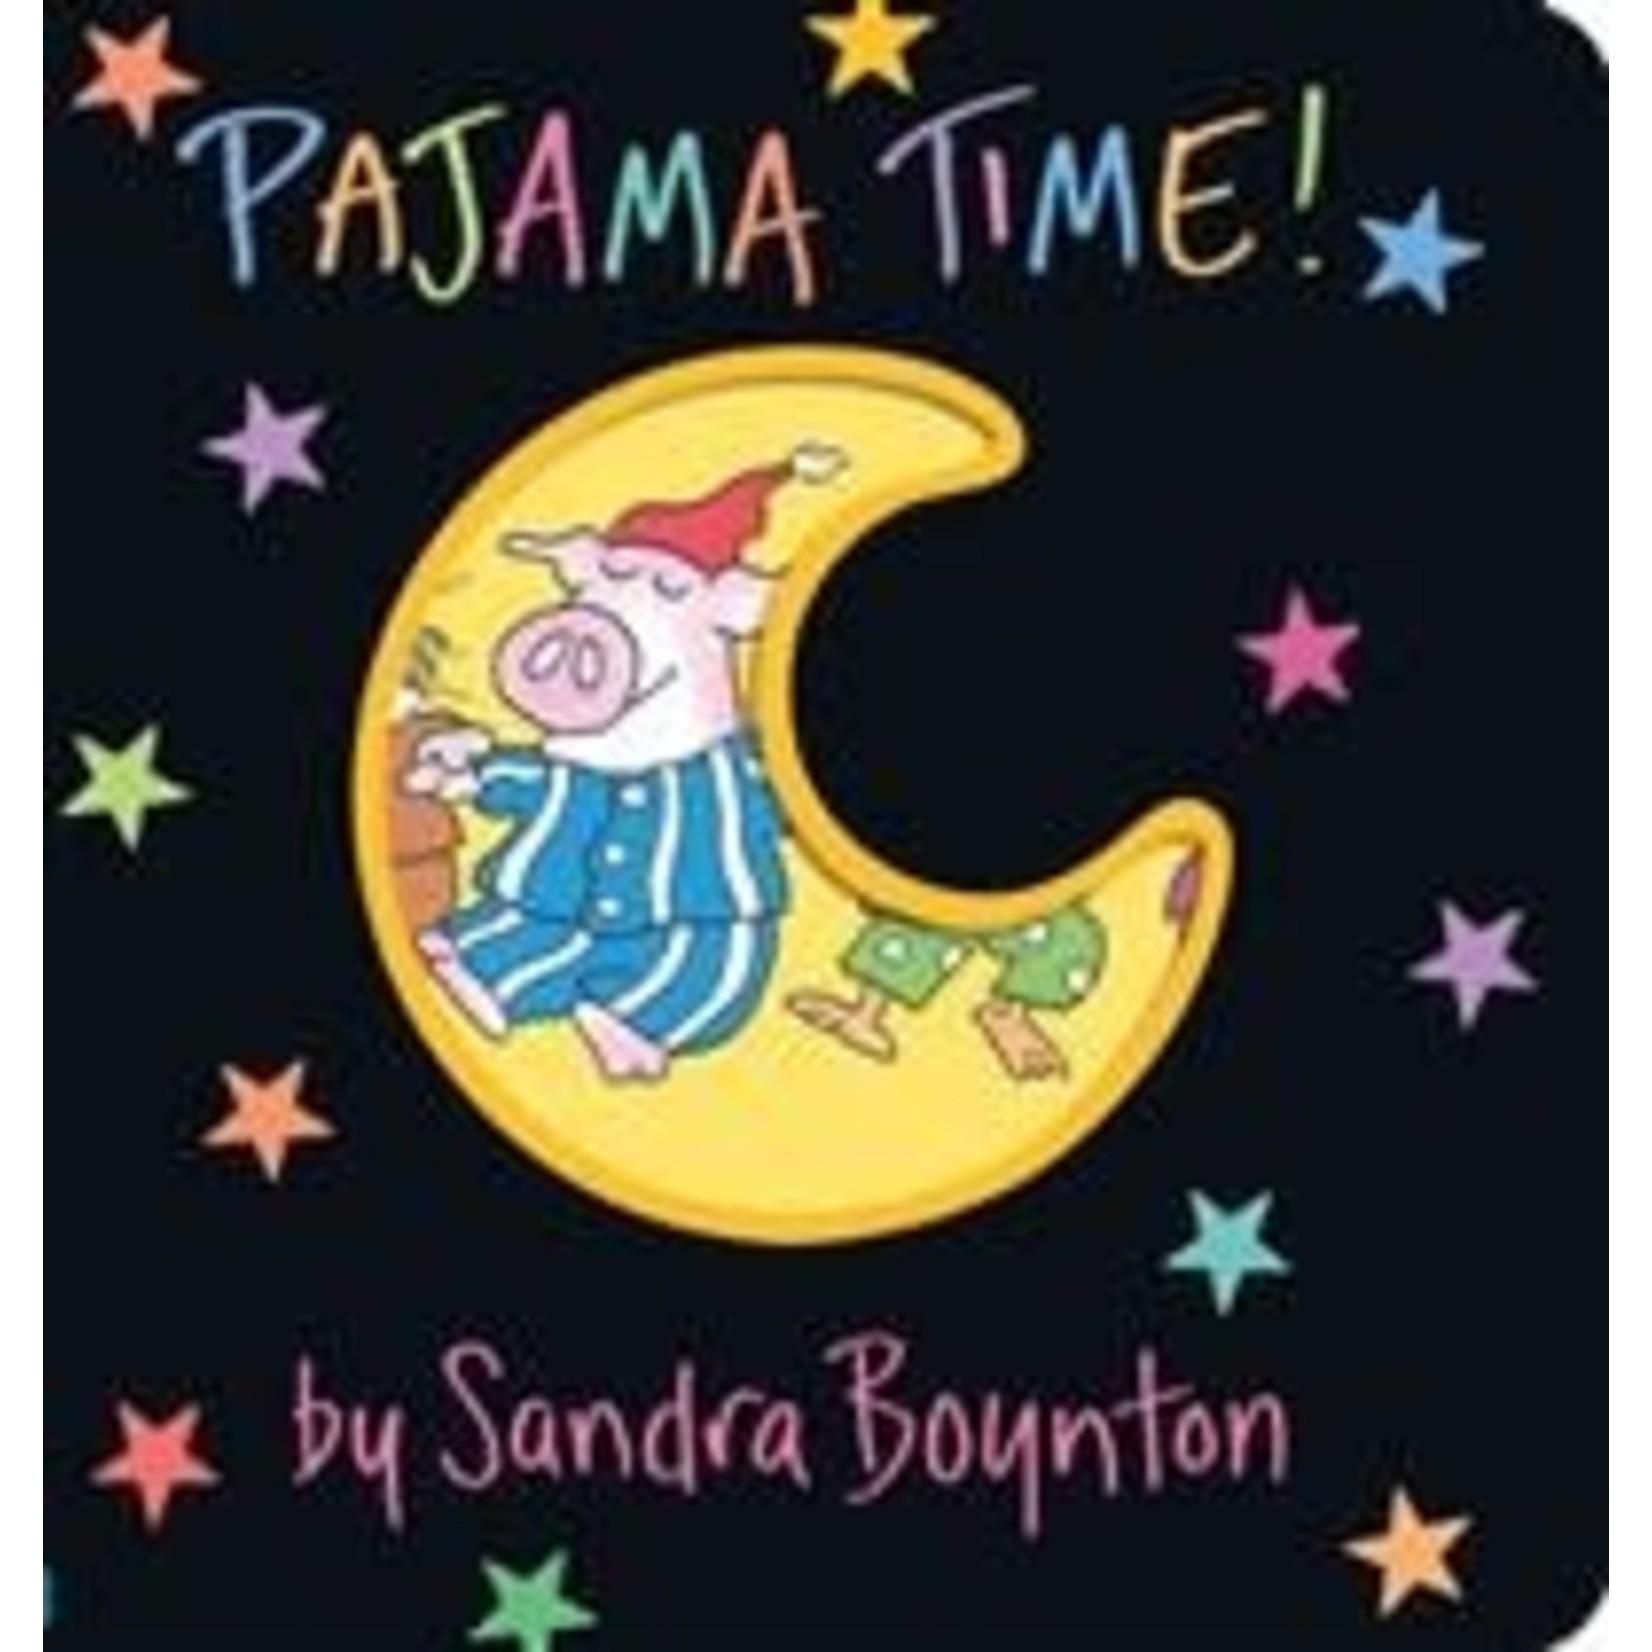 Sandra Boynton Pajama Time